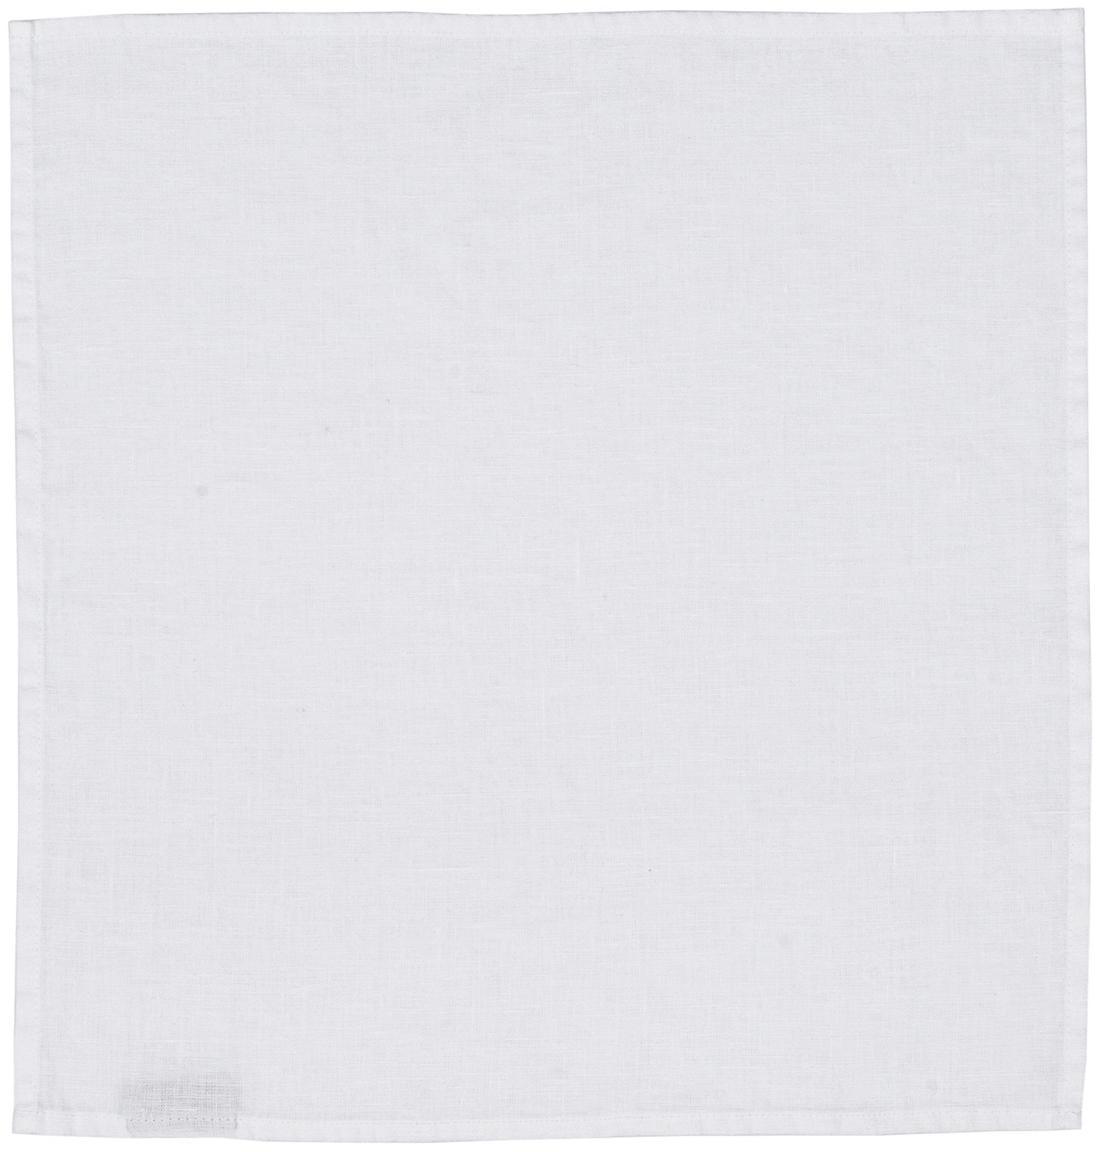 Serwetka z lnu Ruta, 6 szt., Biały, S 43 x D 43 cm